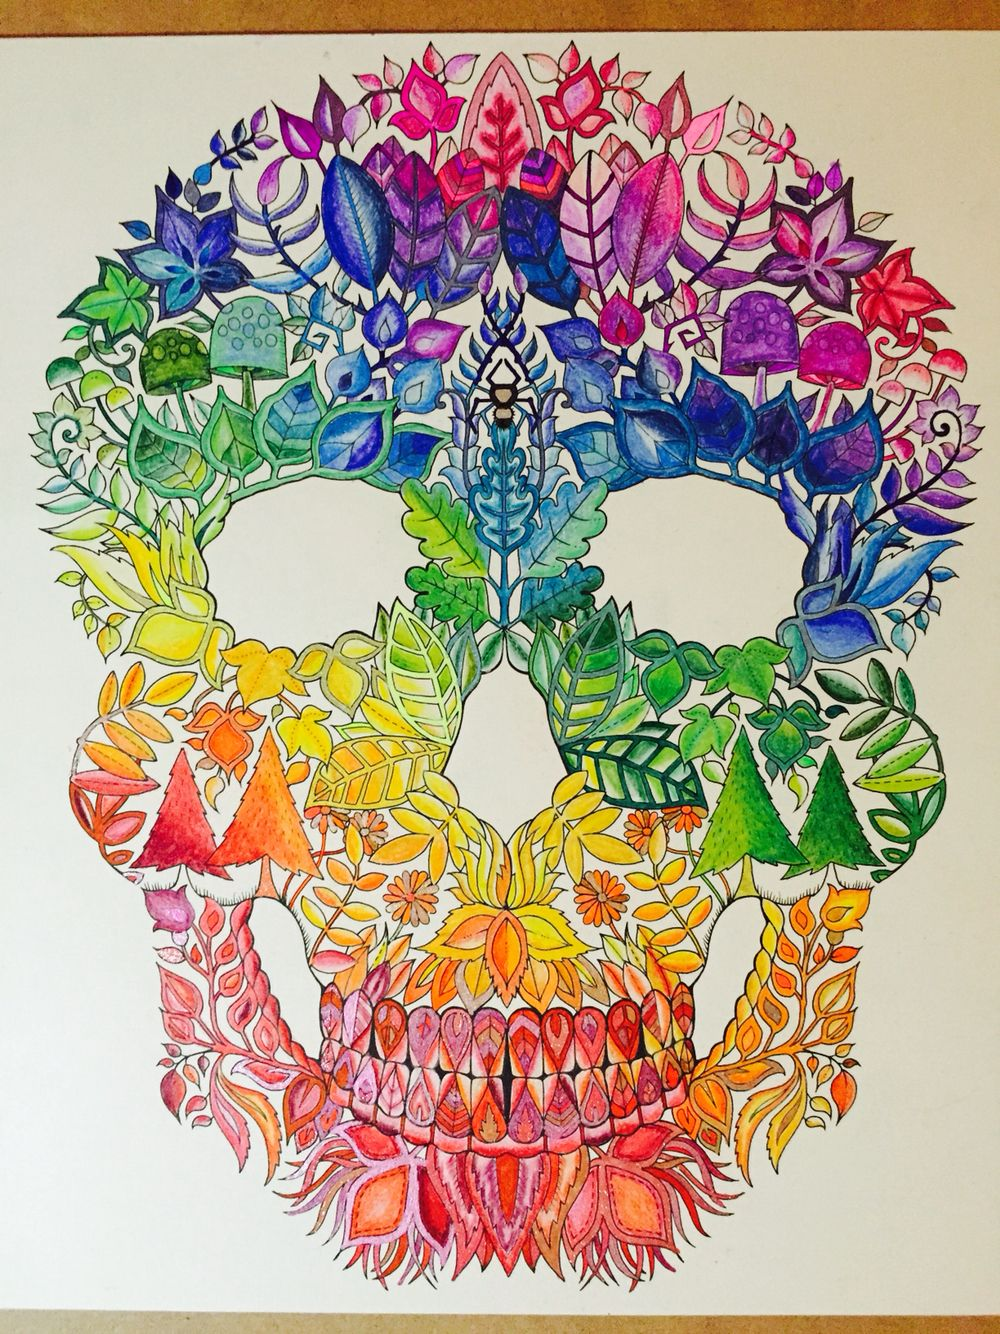 Skull From Johana Basfords Enchanted Forest Using Pencils